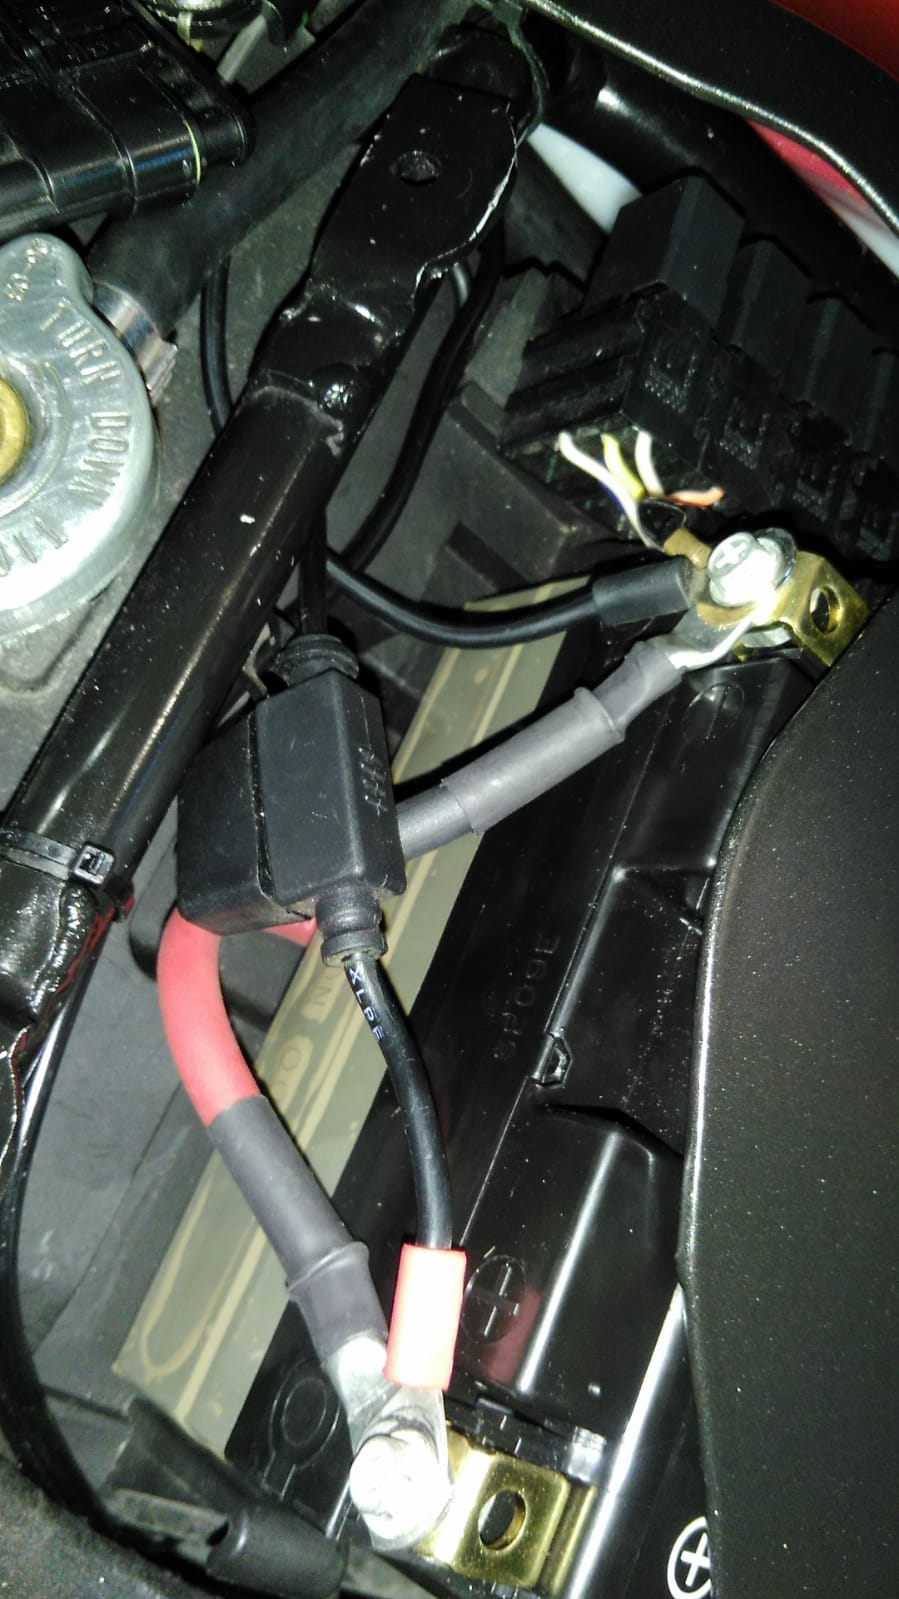 Benelli Tornado Tre 1130 - Battery Cables-img-20201016-wa0014.jpg